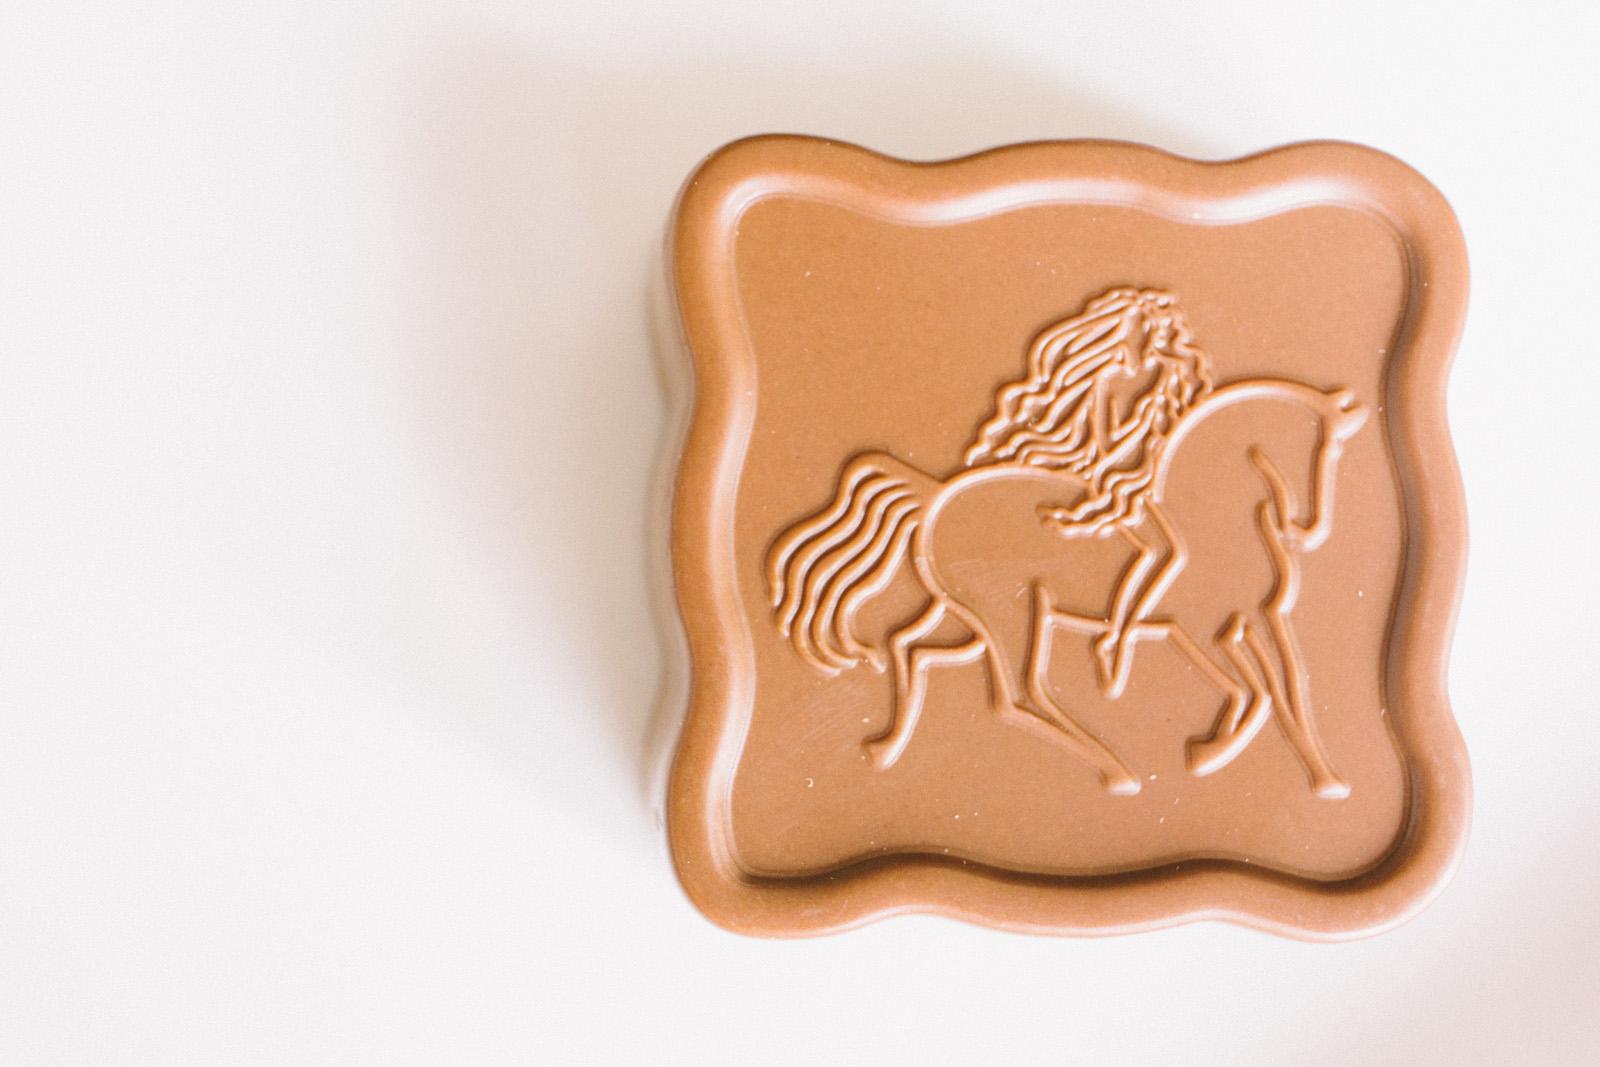 that-food-cray-godiva-chocolate-2013-mid-autumn-festival-mooncakes-35